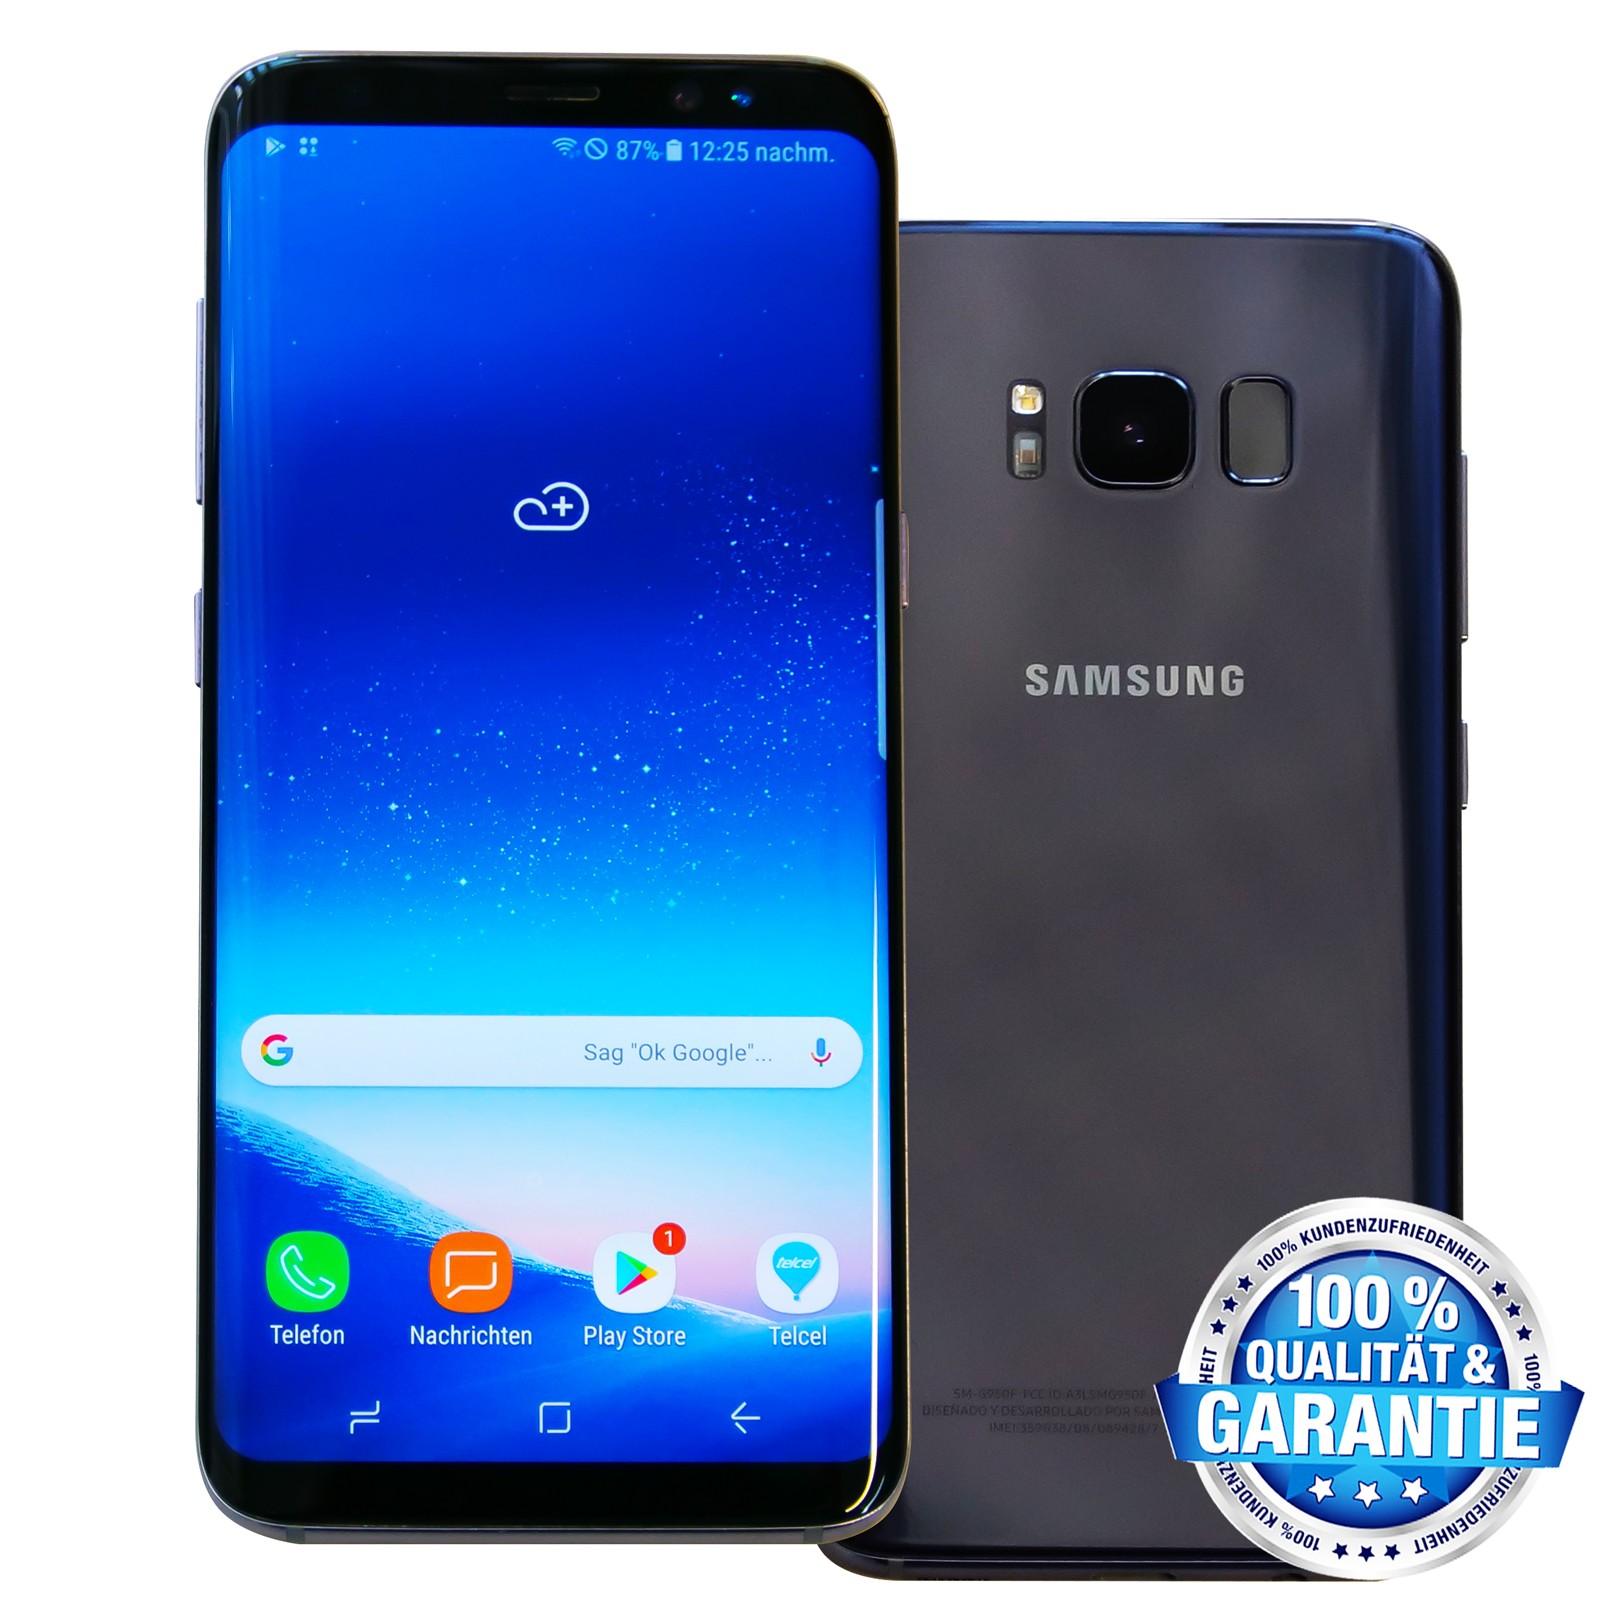 Samsung Galaxy S8 Gebraucht 64gb Ohne Vertrag Grau Eu Computer Alexander Geier Walter Stoll Gbr